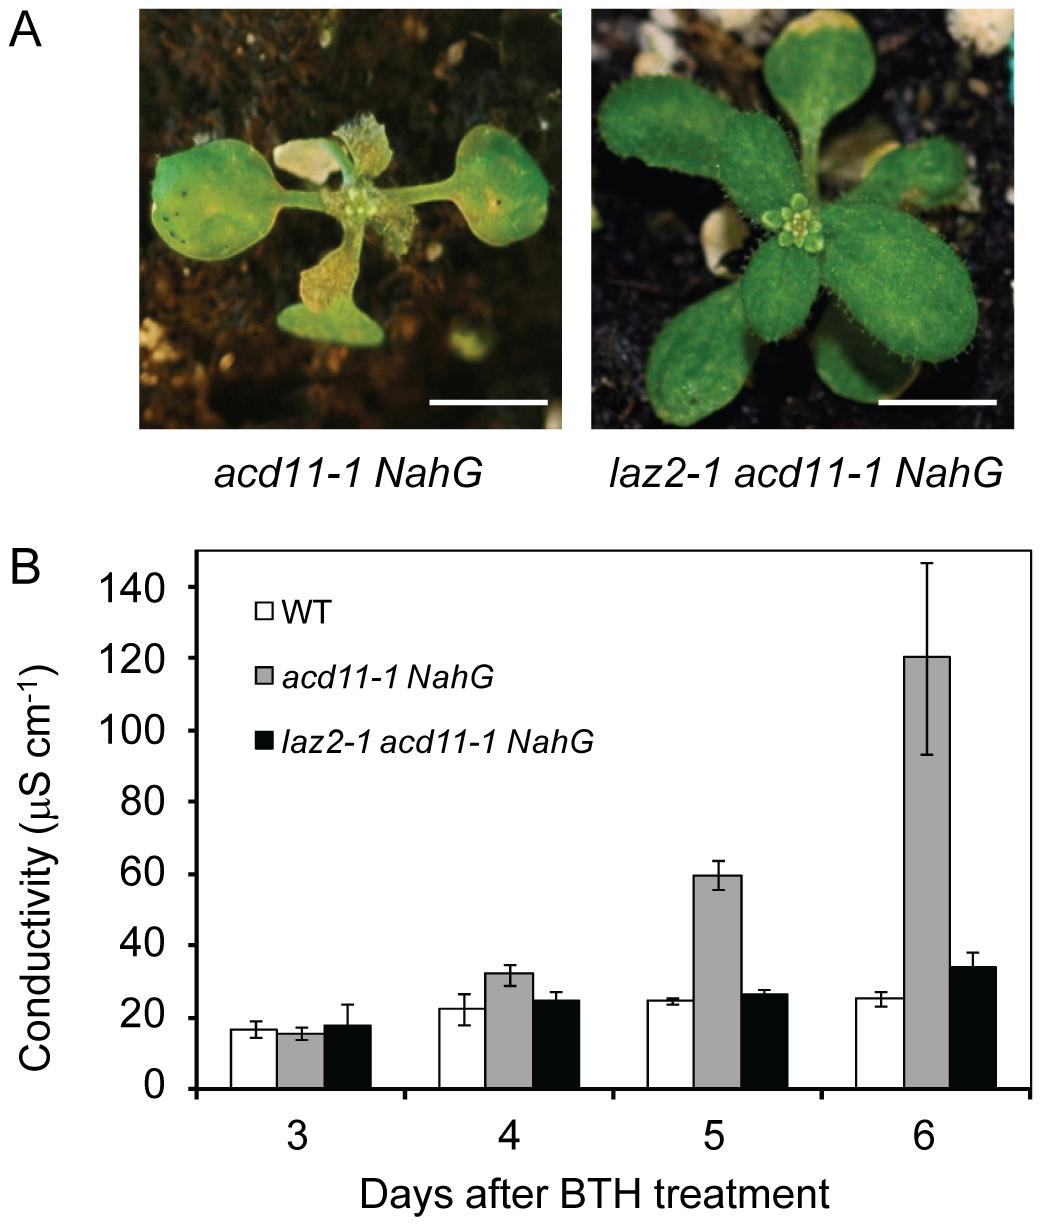 <i>laz2</i> suppresses cell death in <i>acd11</i>.